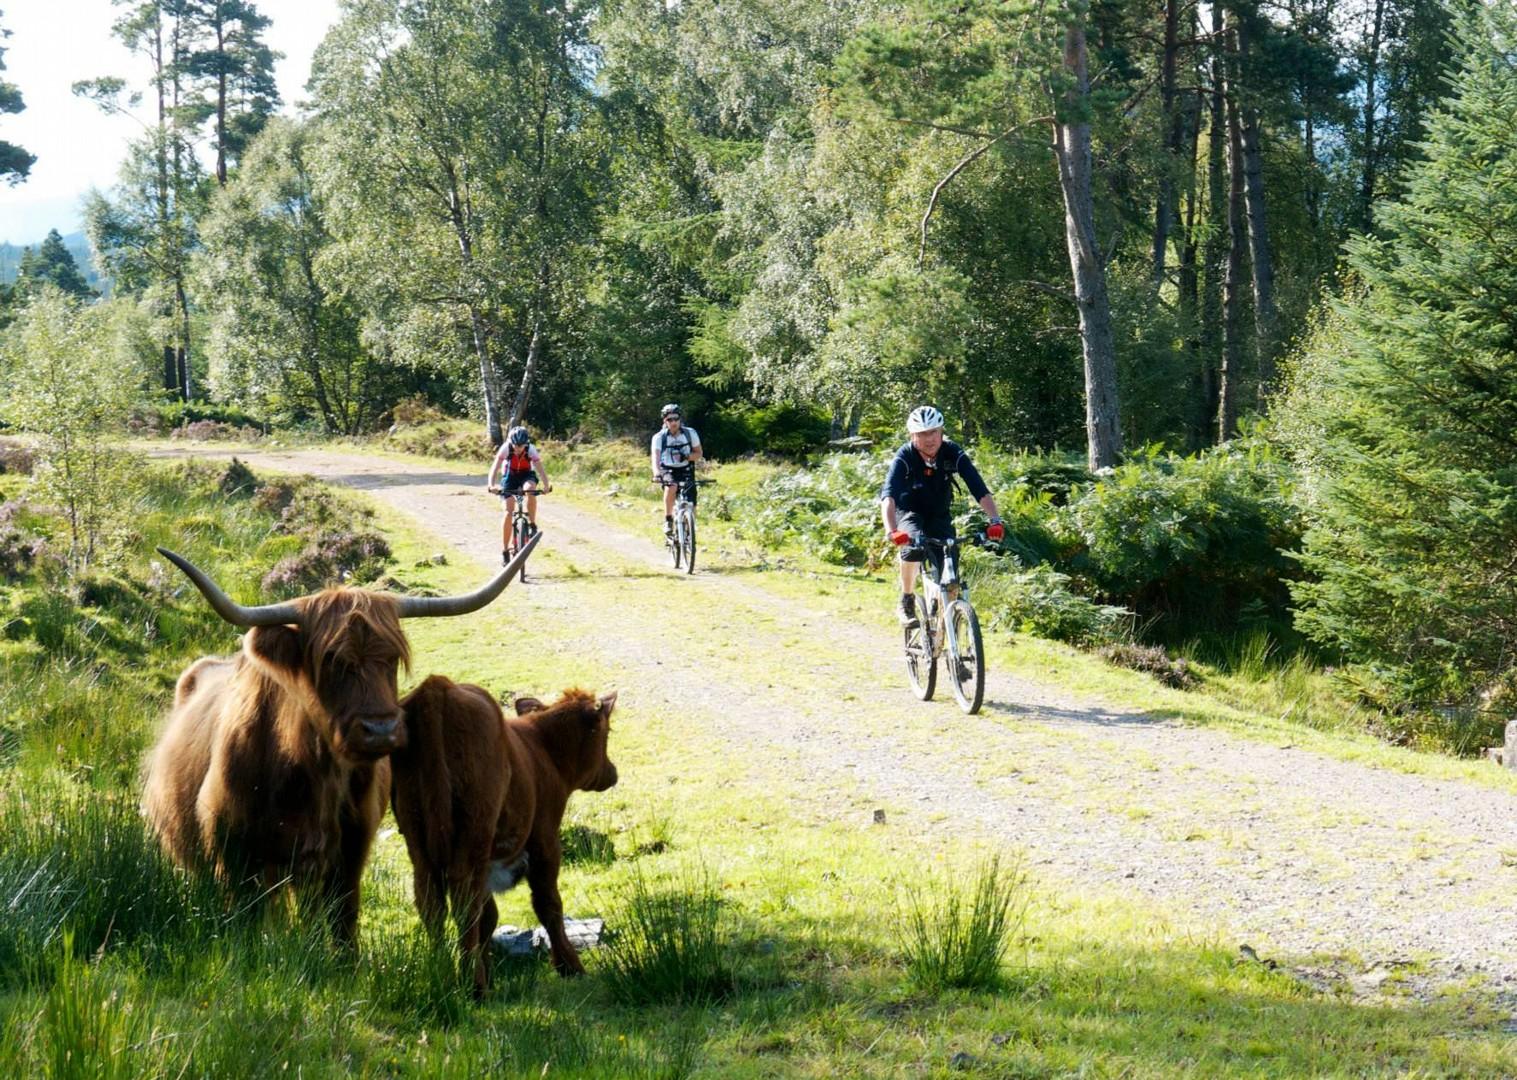 highland-cows-scottish-cycling-holiday.jpg - Scotland - Celtic Crossing - Guided Mountain Bike Holiday - Mountain Biking